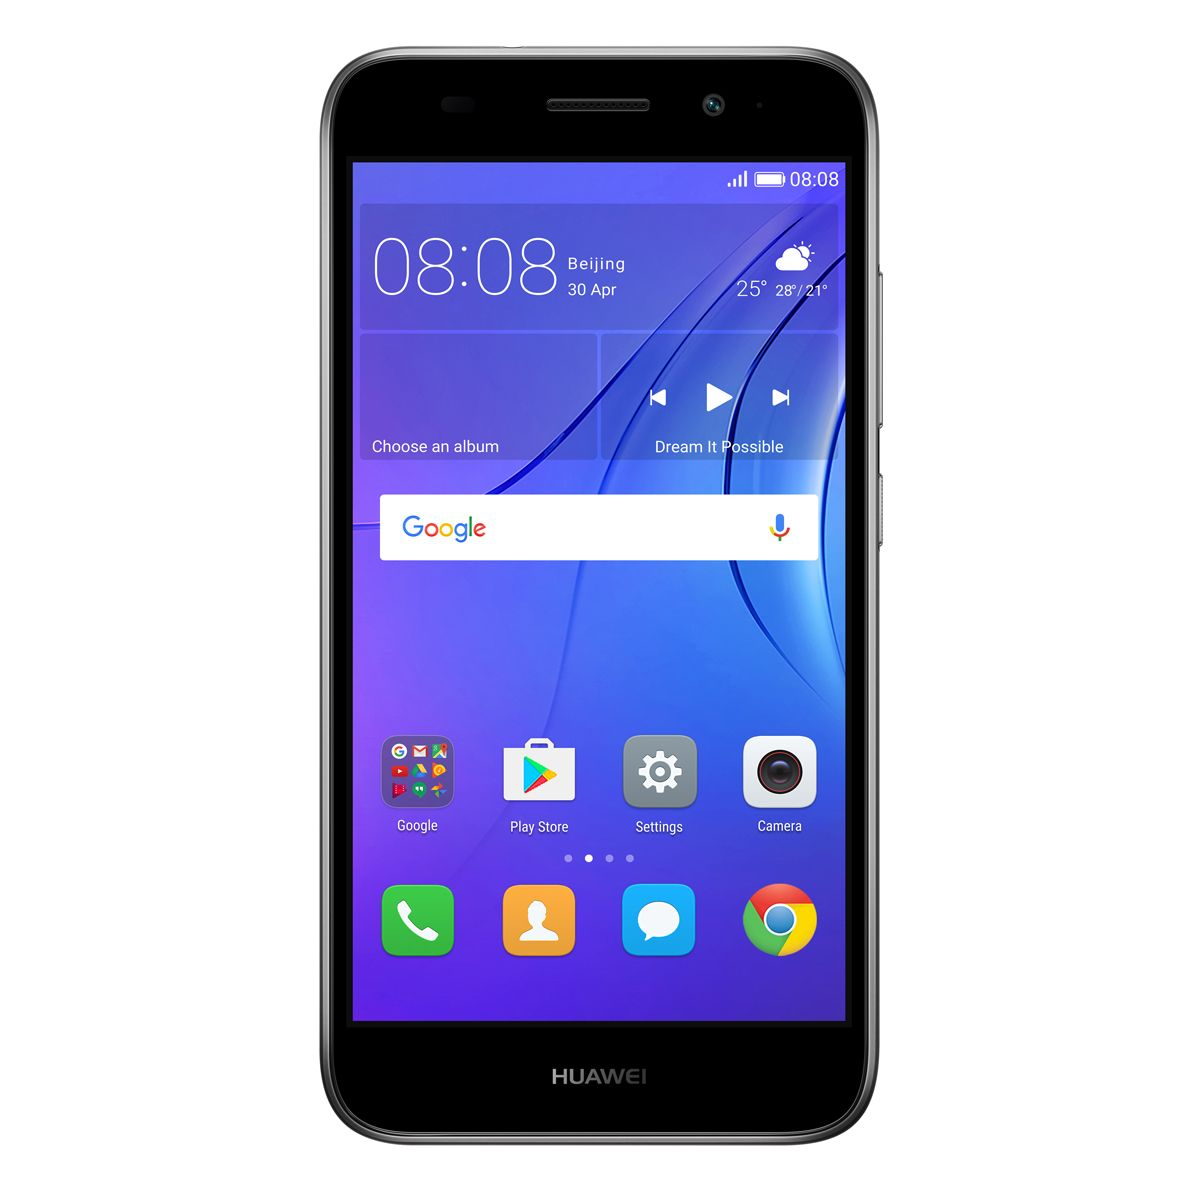 Huawei Y5 lite - Celulares - Tigo Colombia